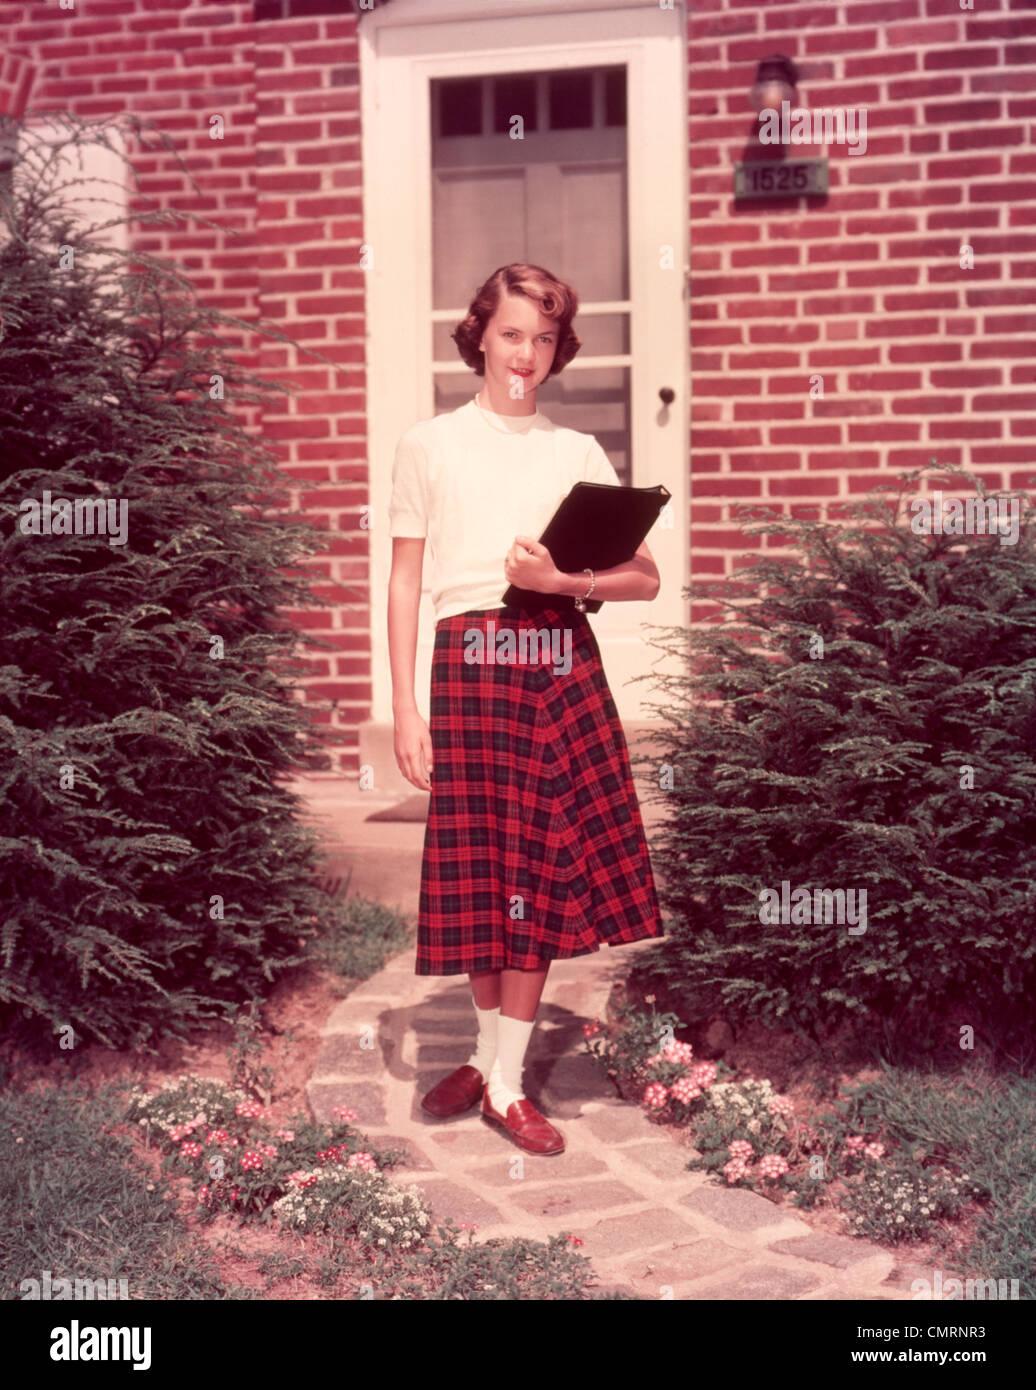 1950s Woman Walking Imágenes De Stock & 1950s Woman Walking Fotos De ...